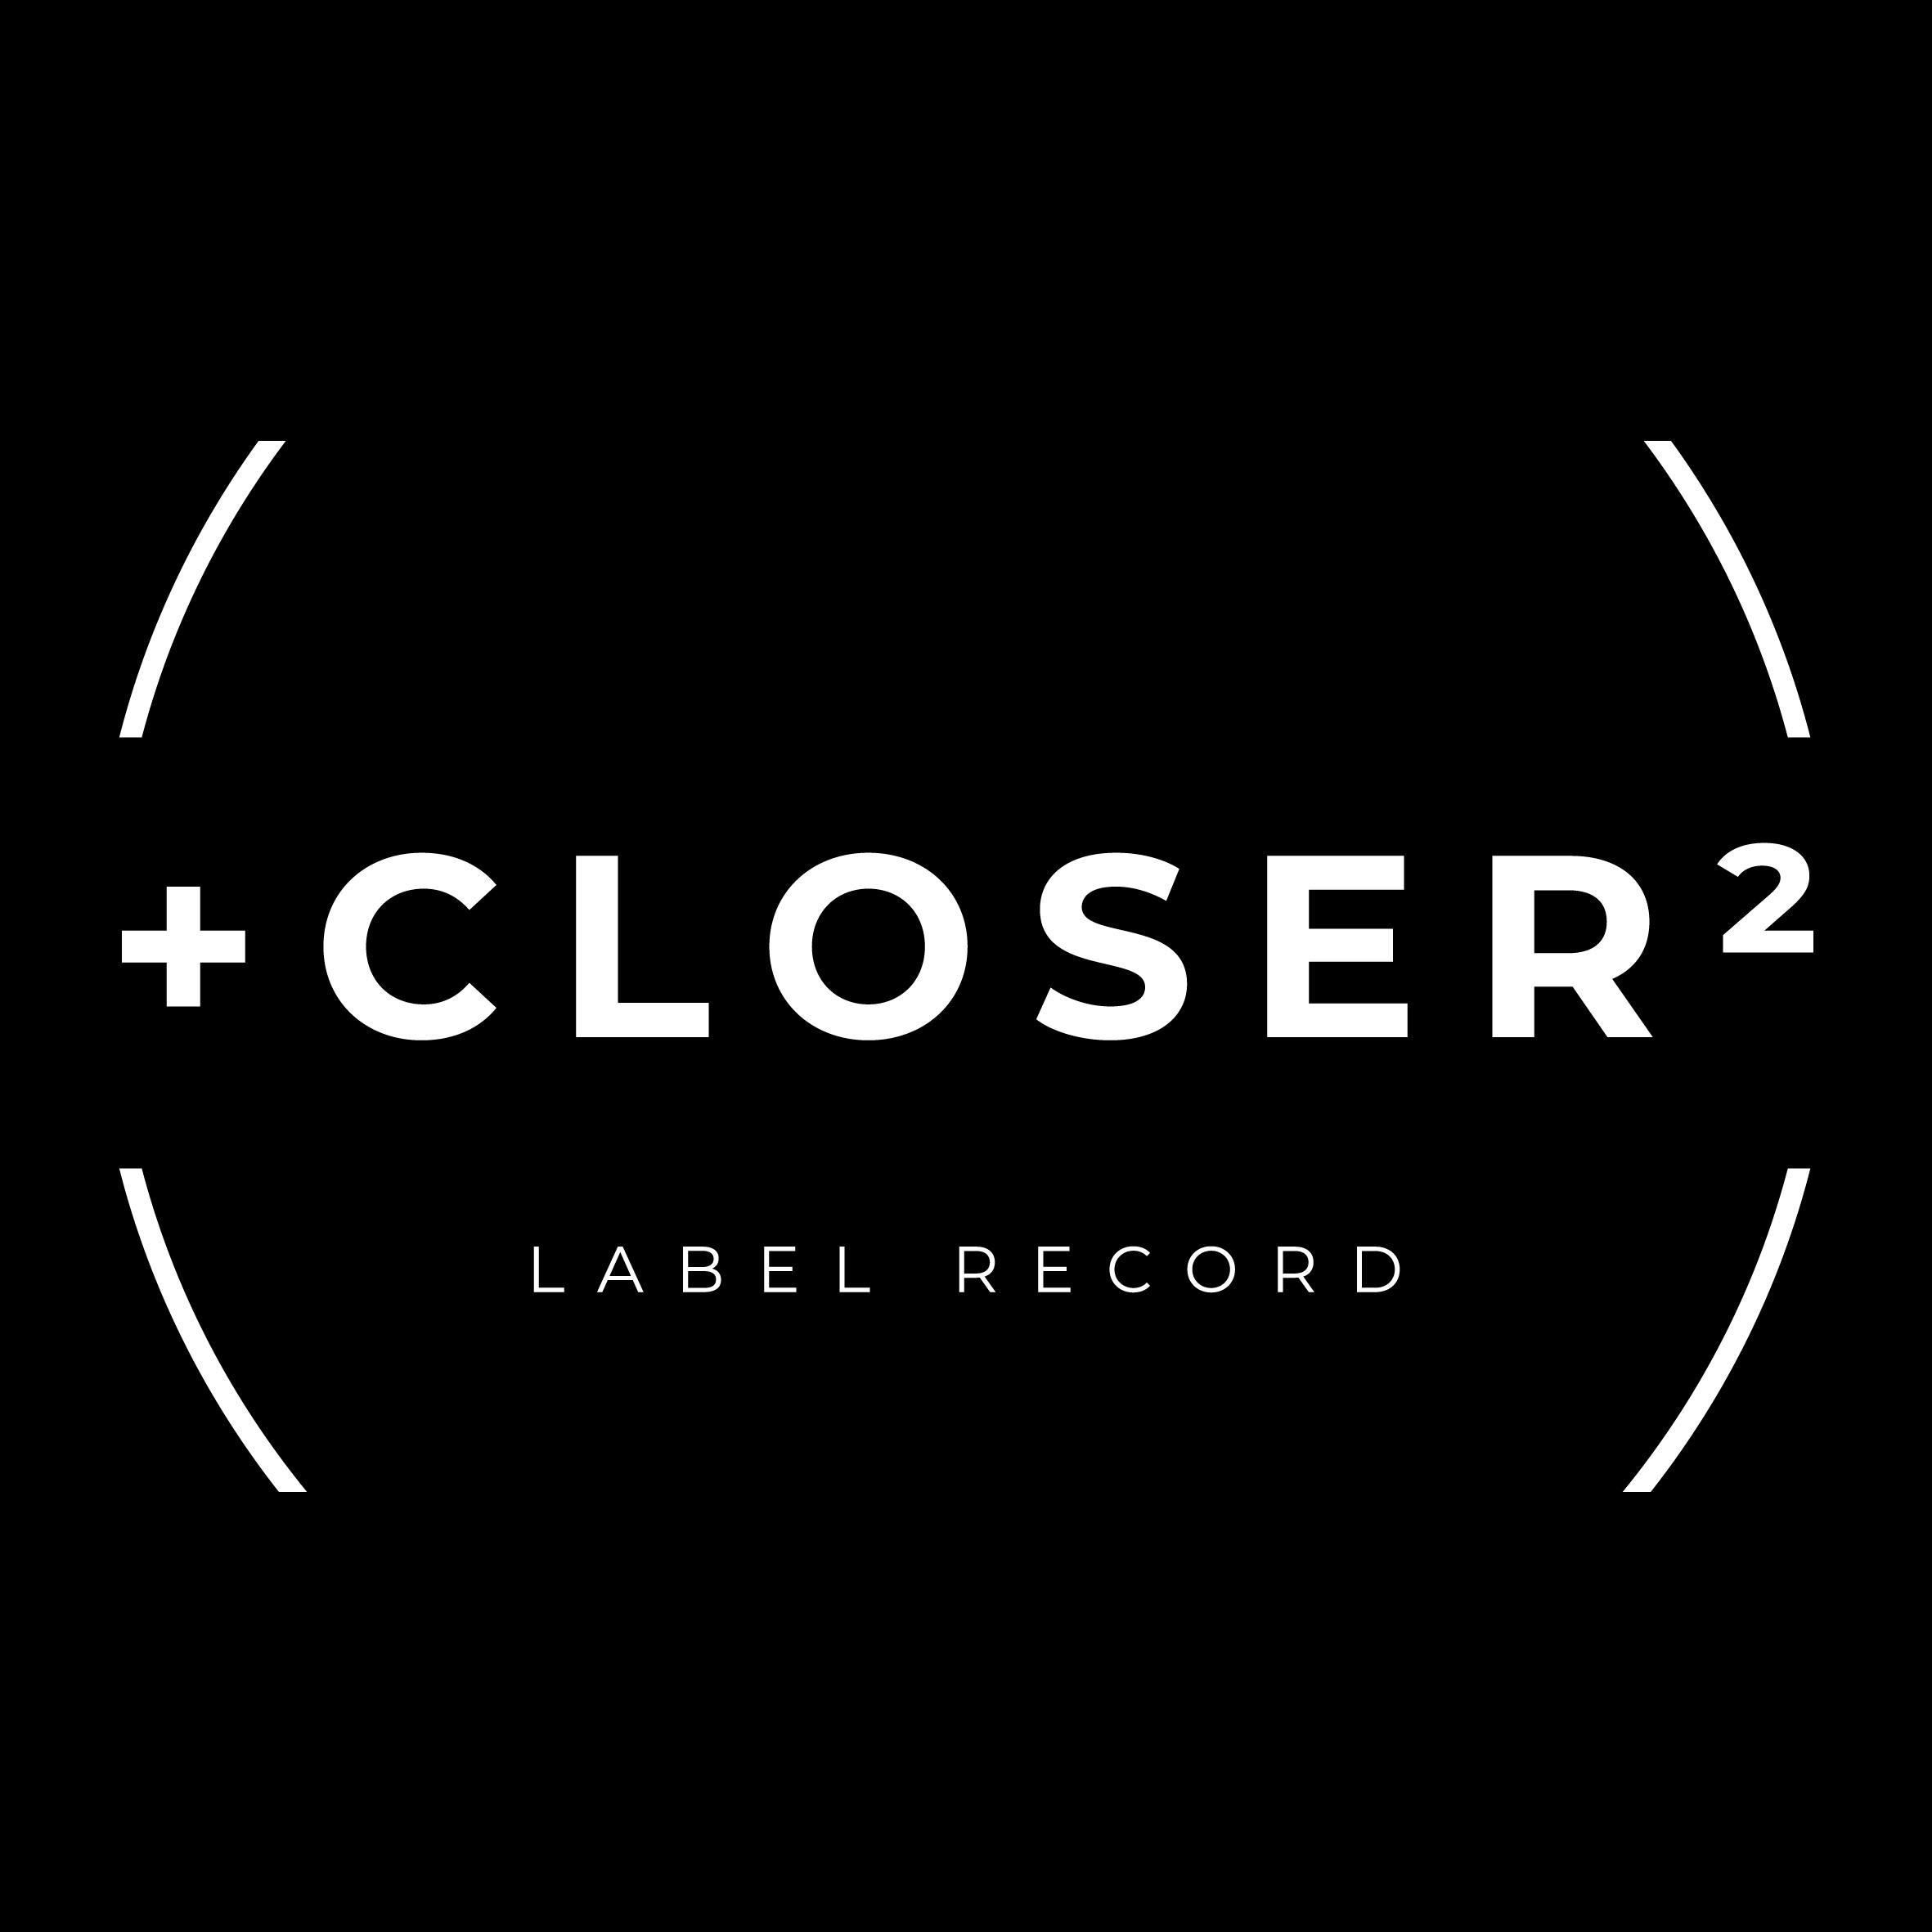 + Closer 2